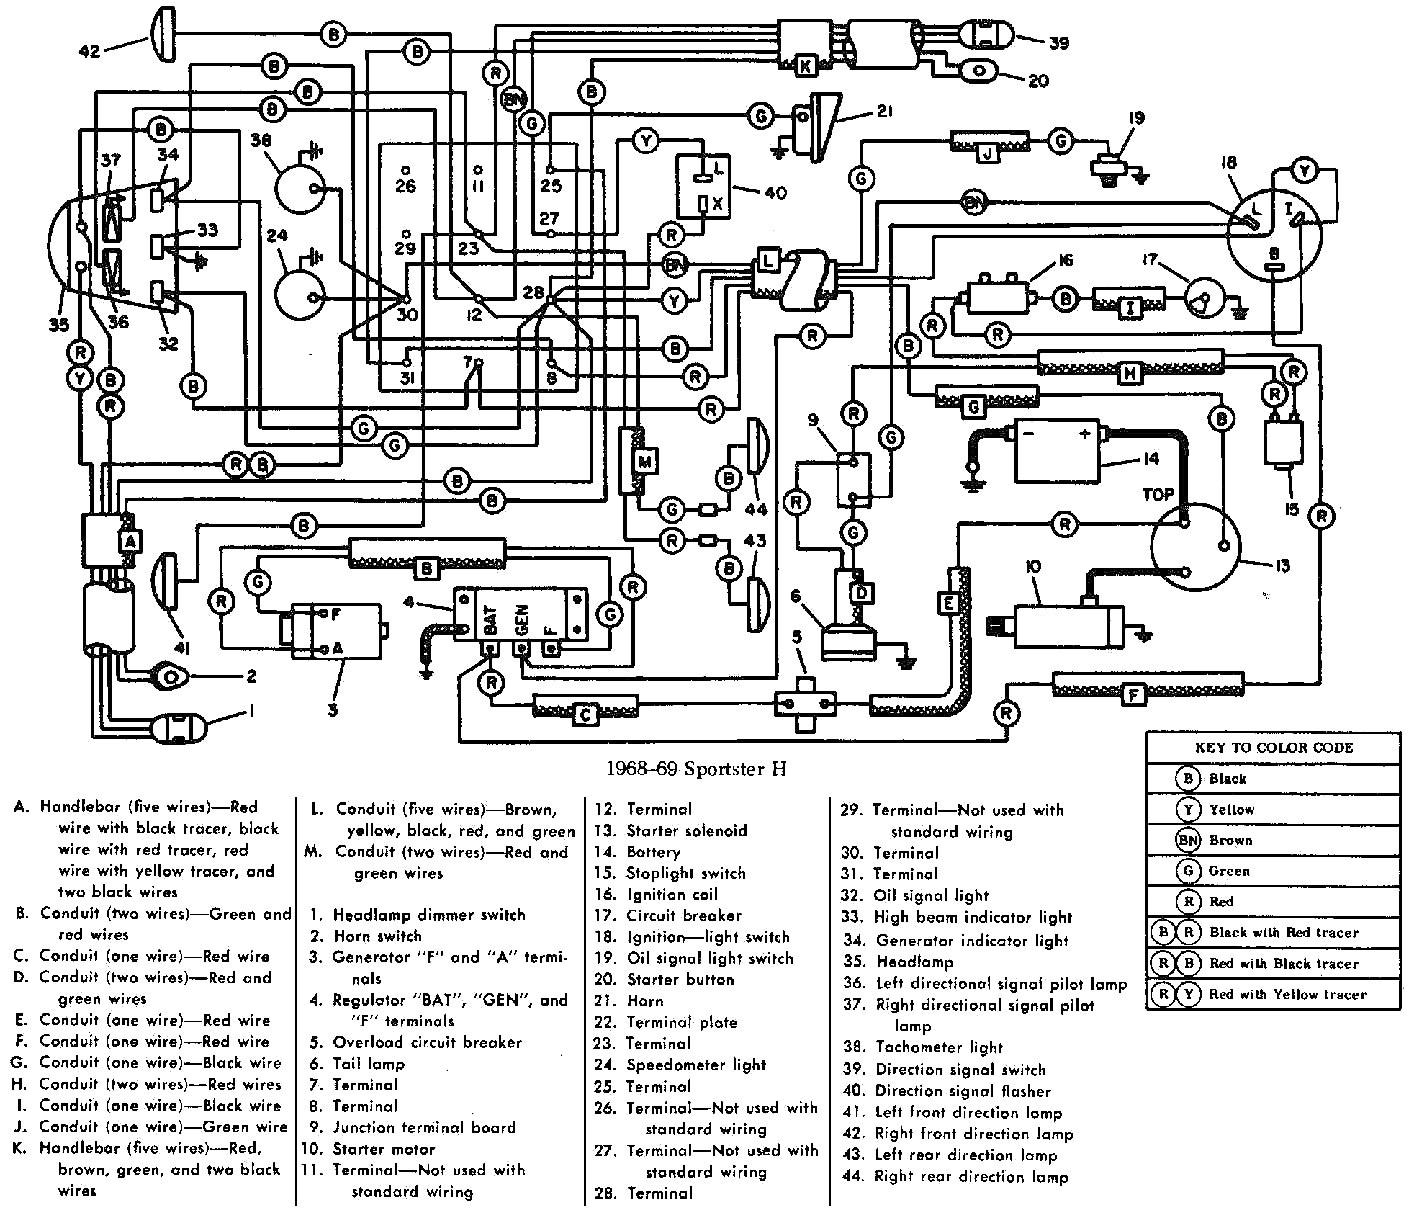 Badlands 1995 Harley Turn Signal Wiring Diagram - Catalogue ... on